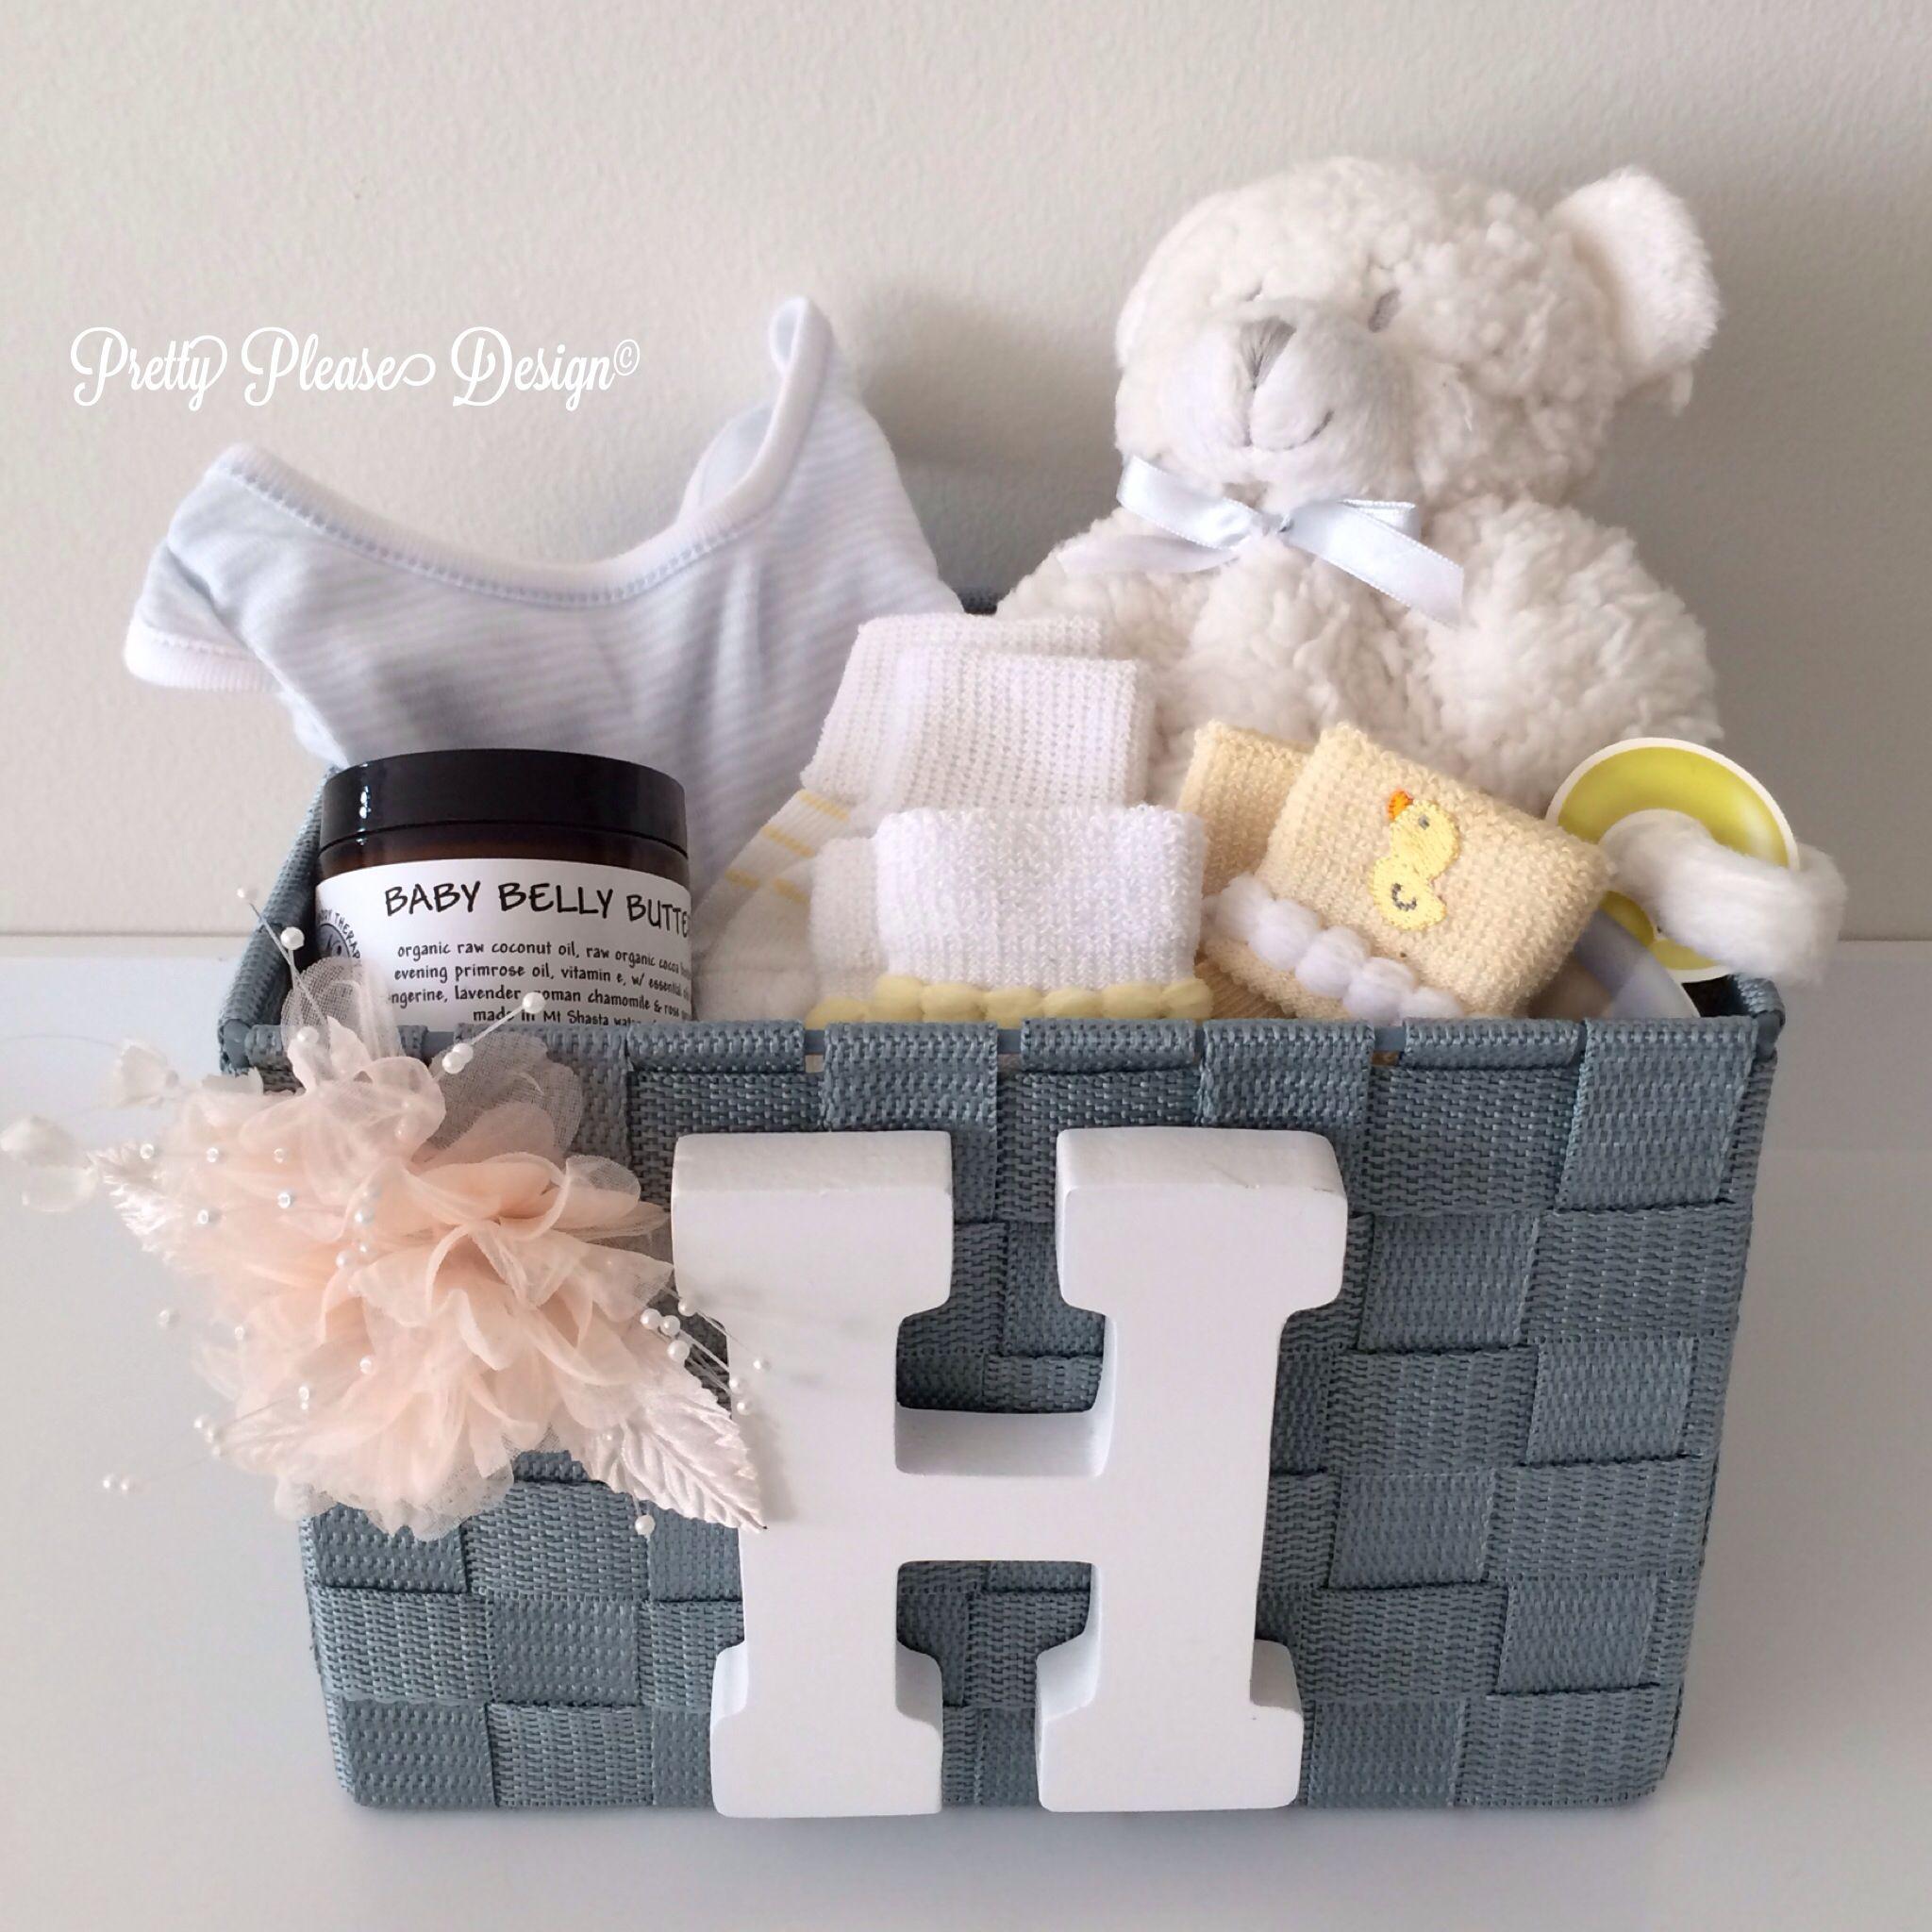 Pretty Please Baby Itsaprettygirl Itsaprettyboy Prettypleasedesign Welcomebasket Gifts For Pregnant Friend